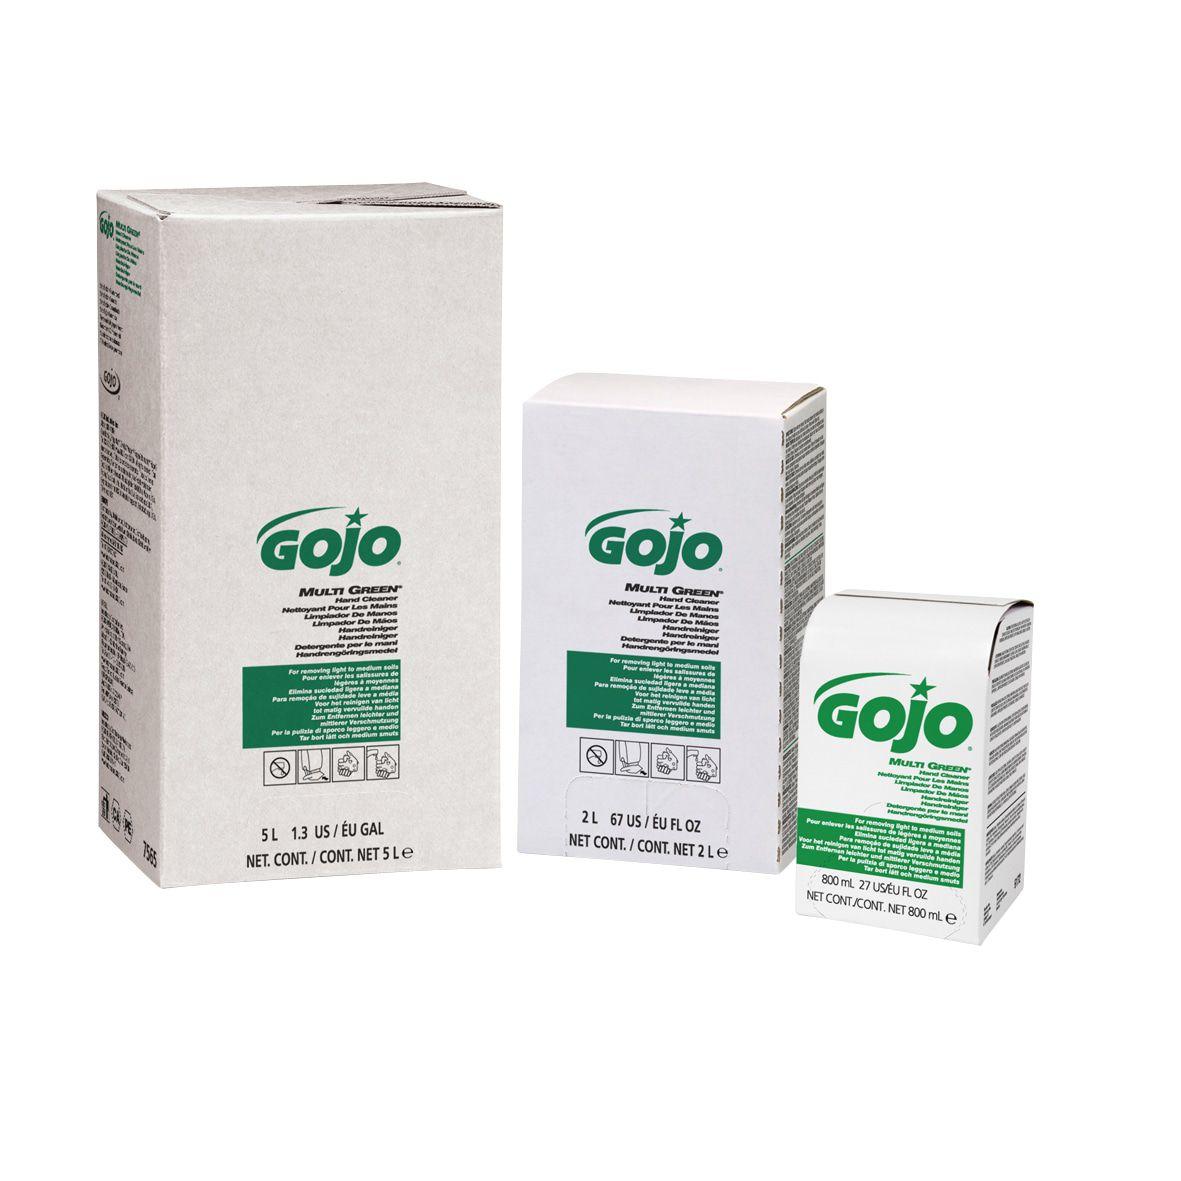 Gojo Multi Huidverz. 12x800ml (P9172-12)